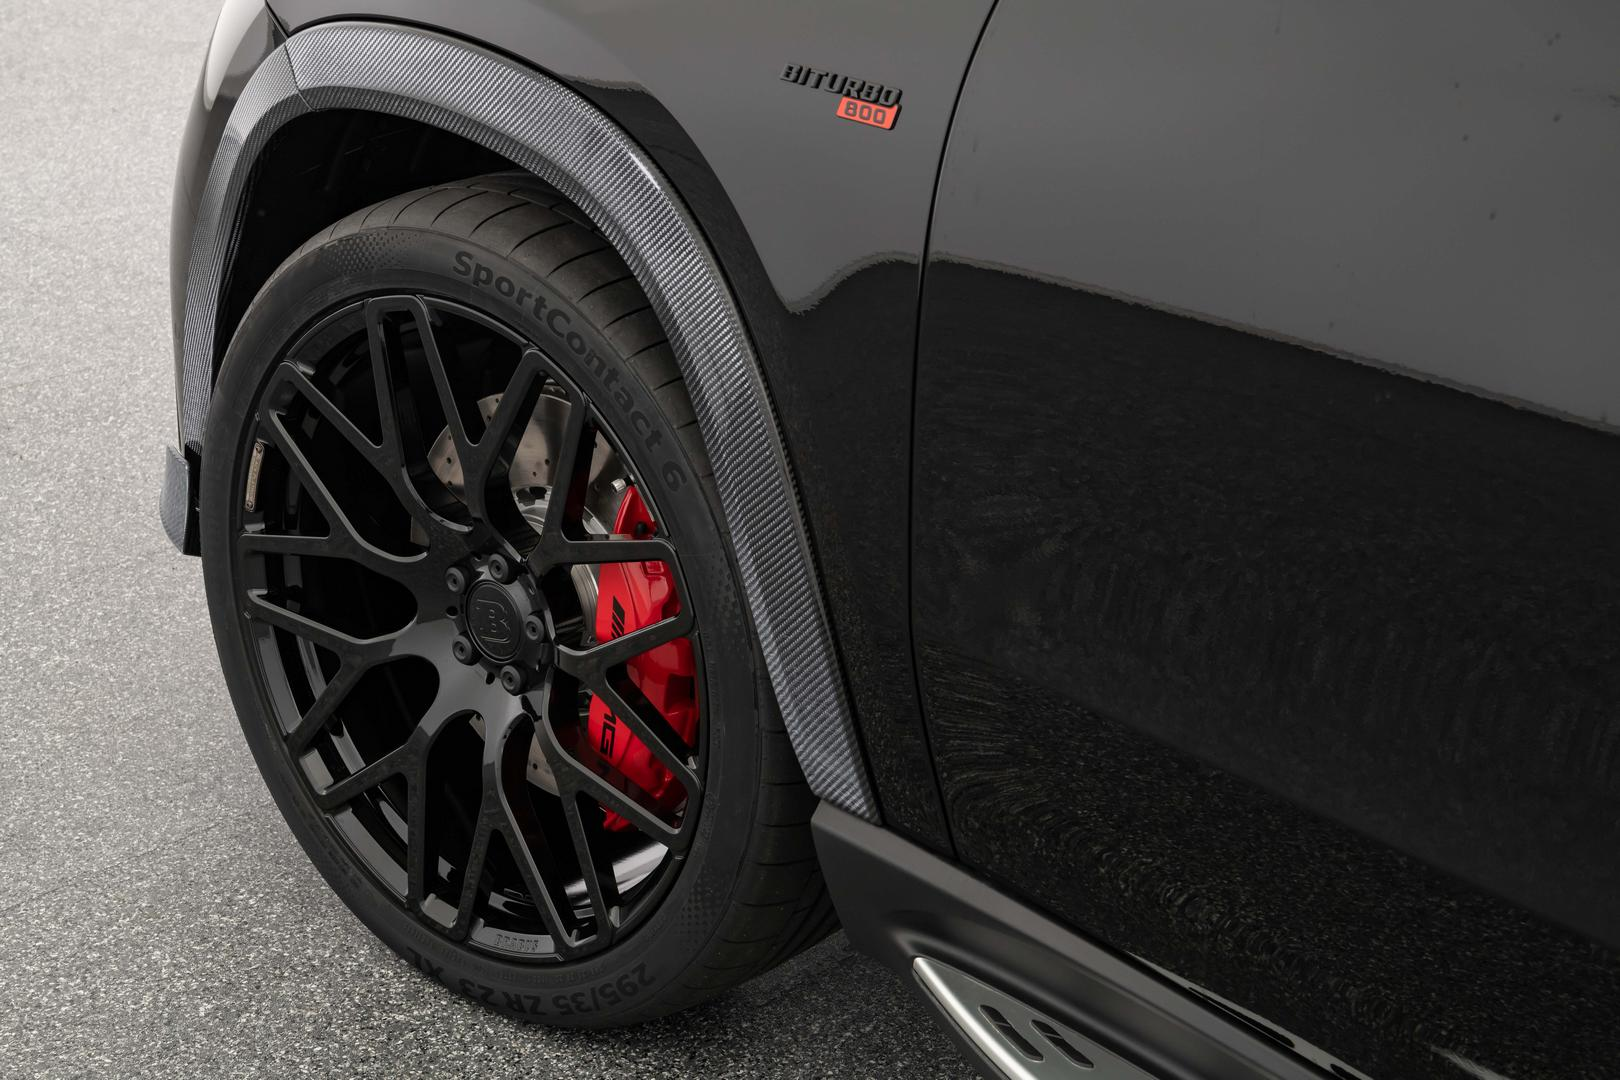 Brabus 800 GLE 63 S Coupe wheels